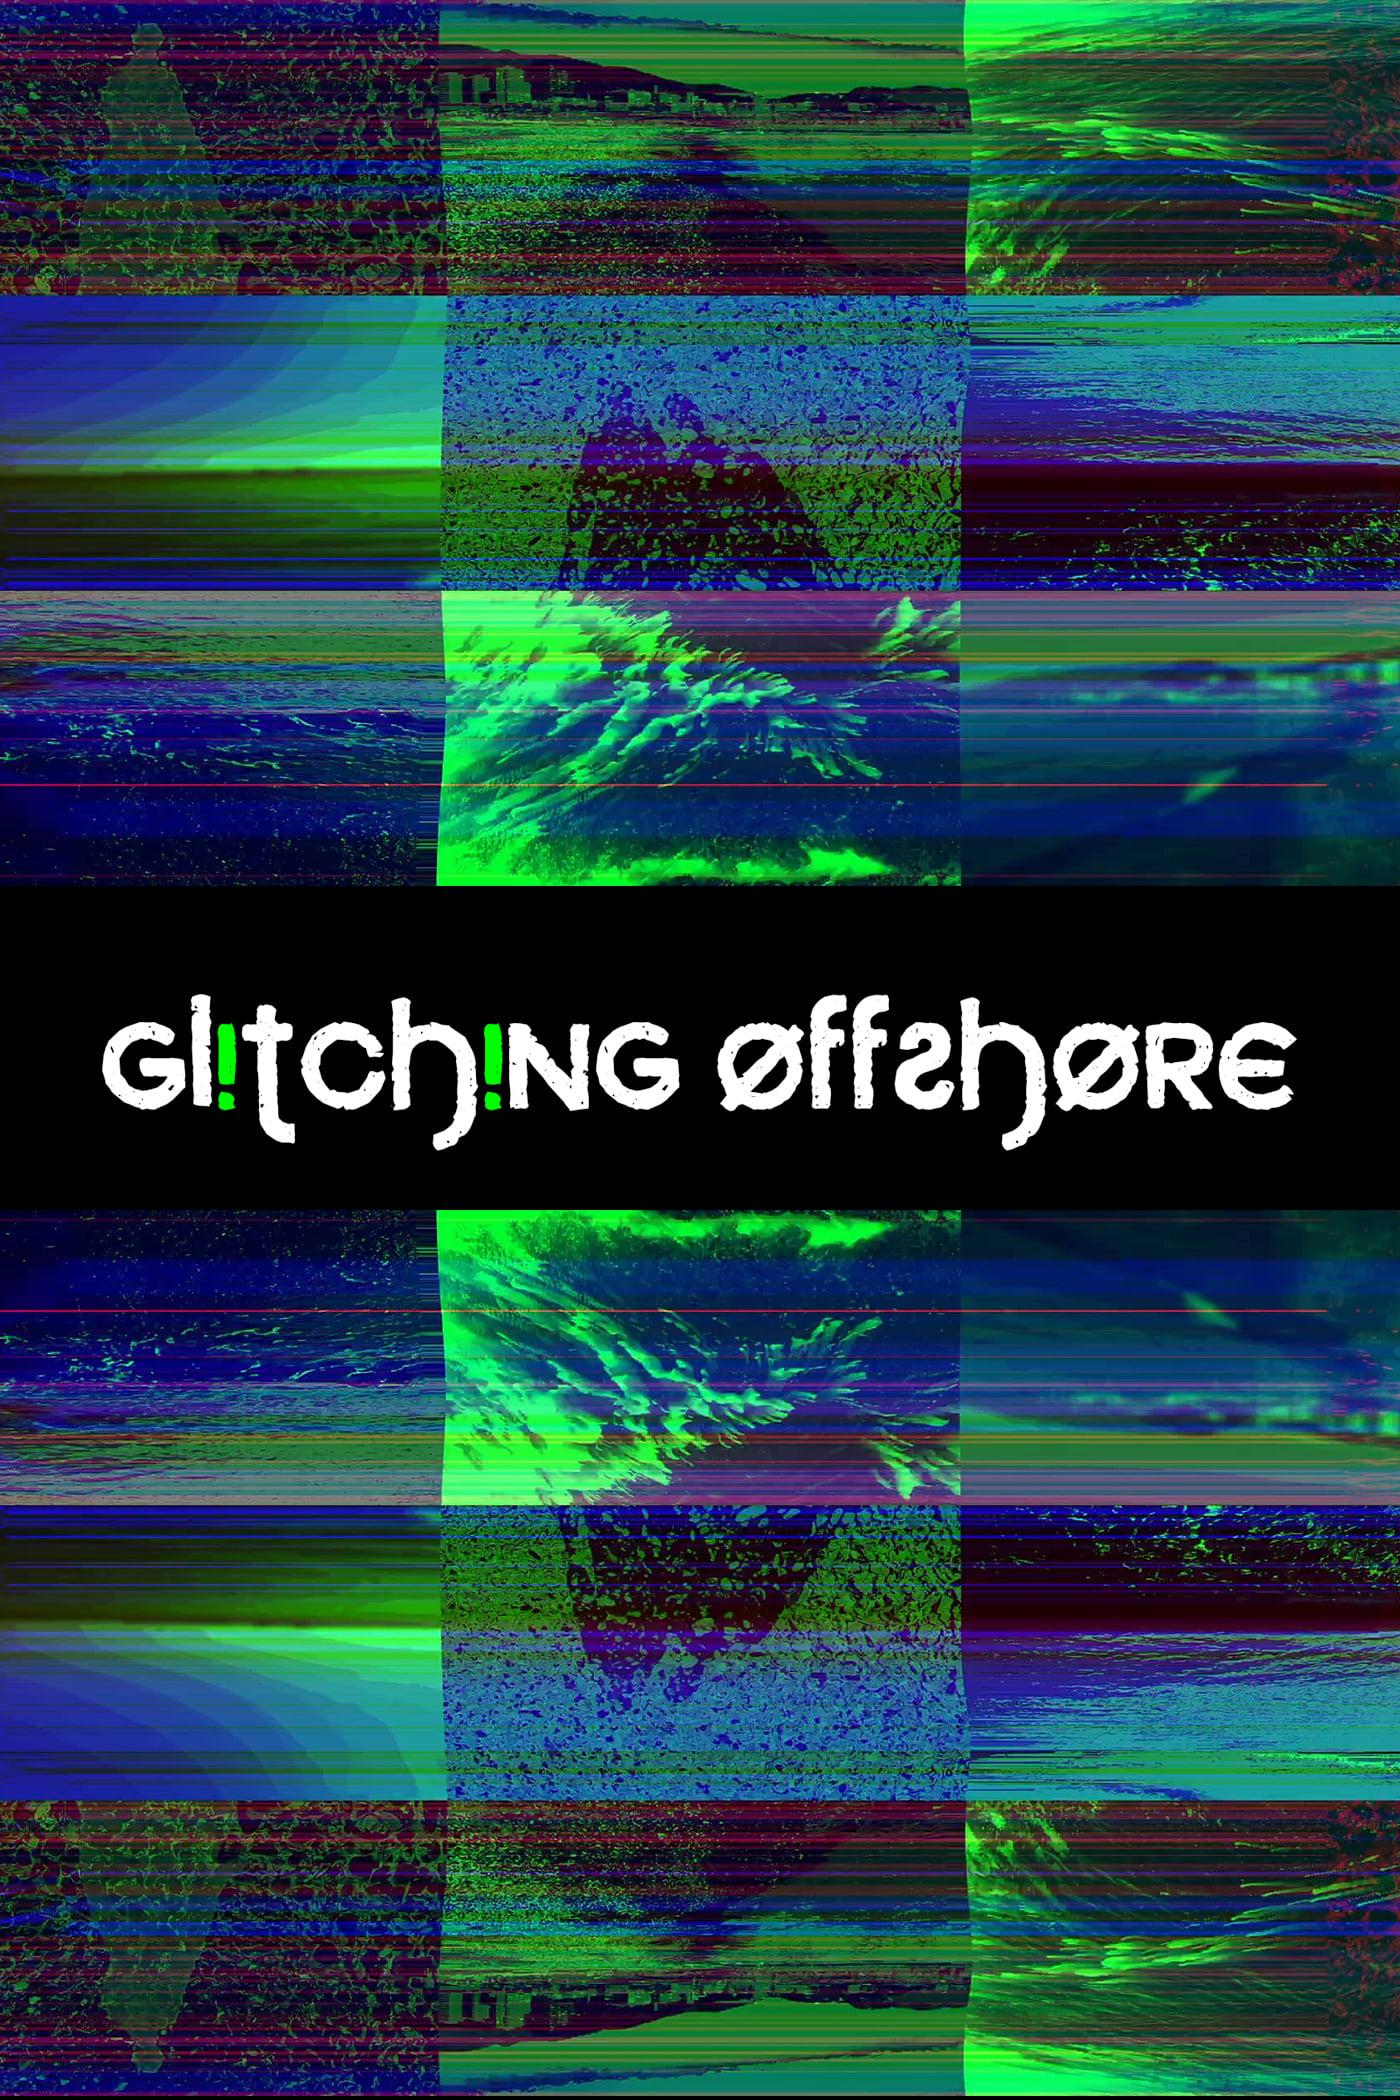 Glitching Offshore